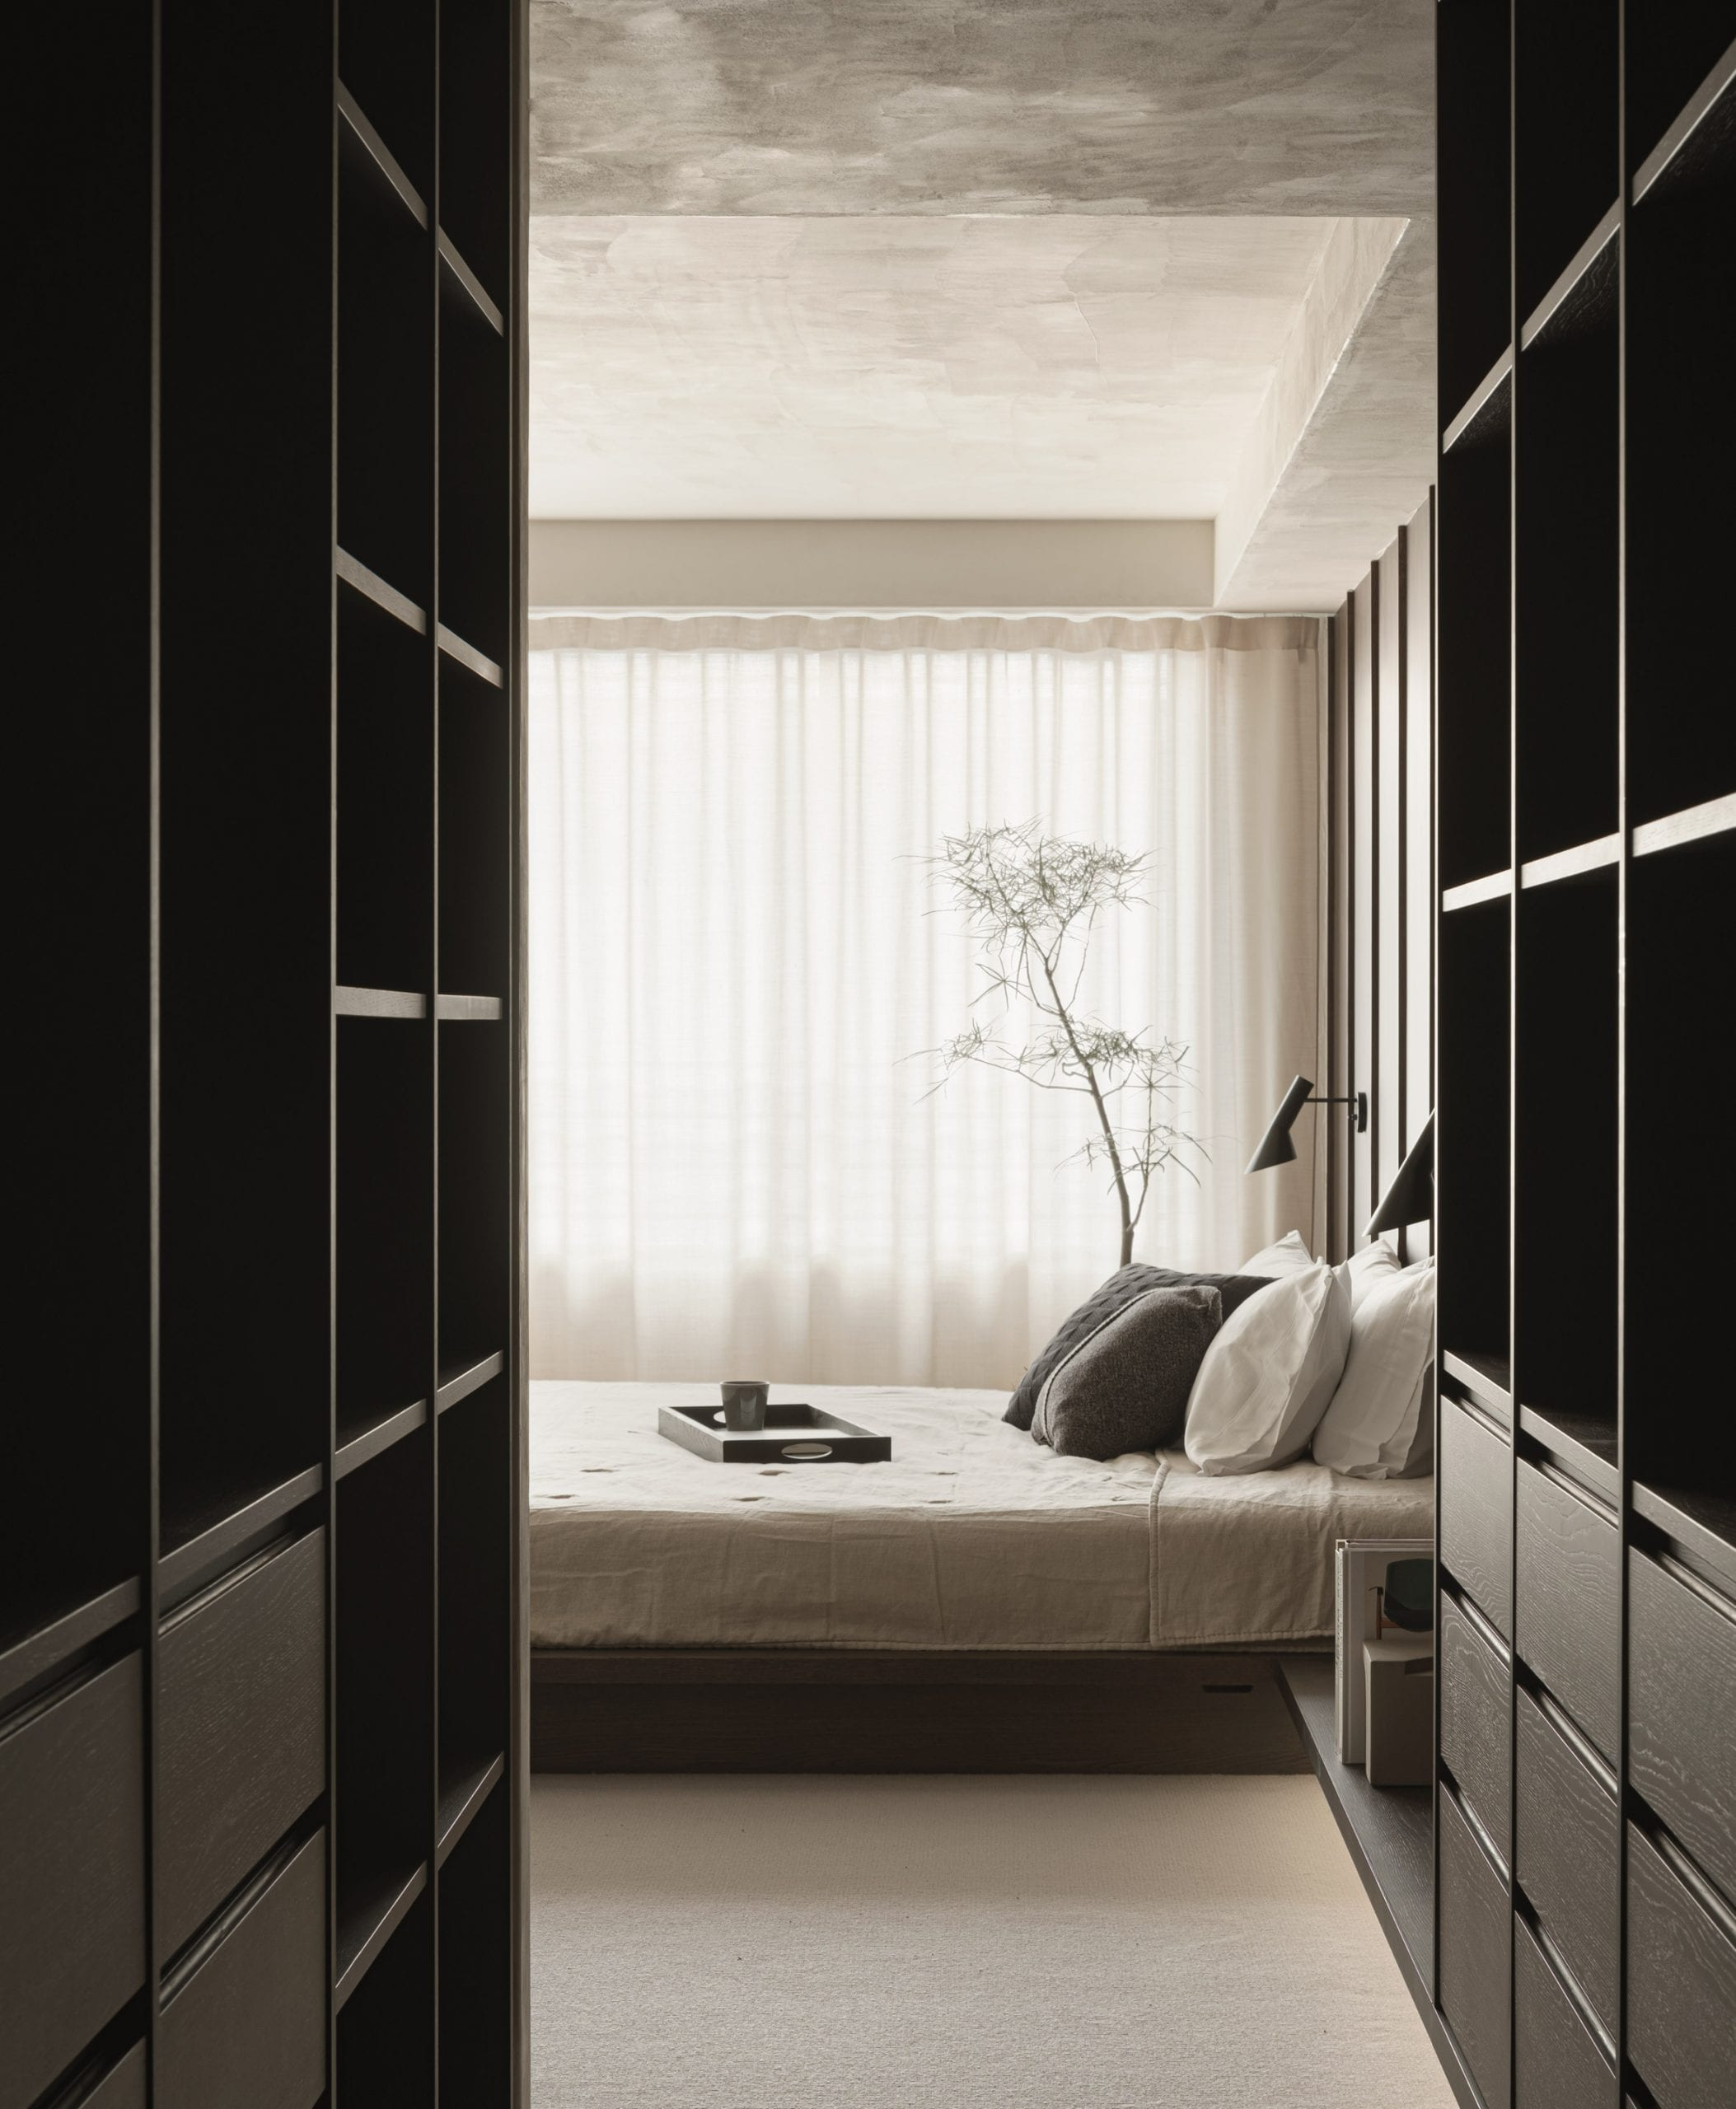 Bedroom storage cabinets in dark wood